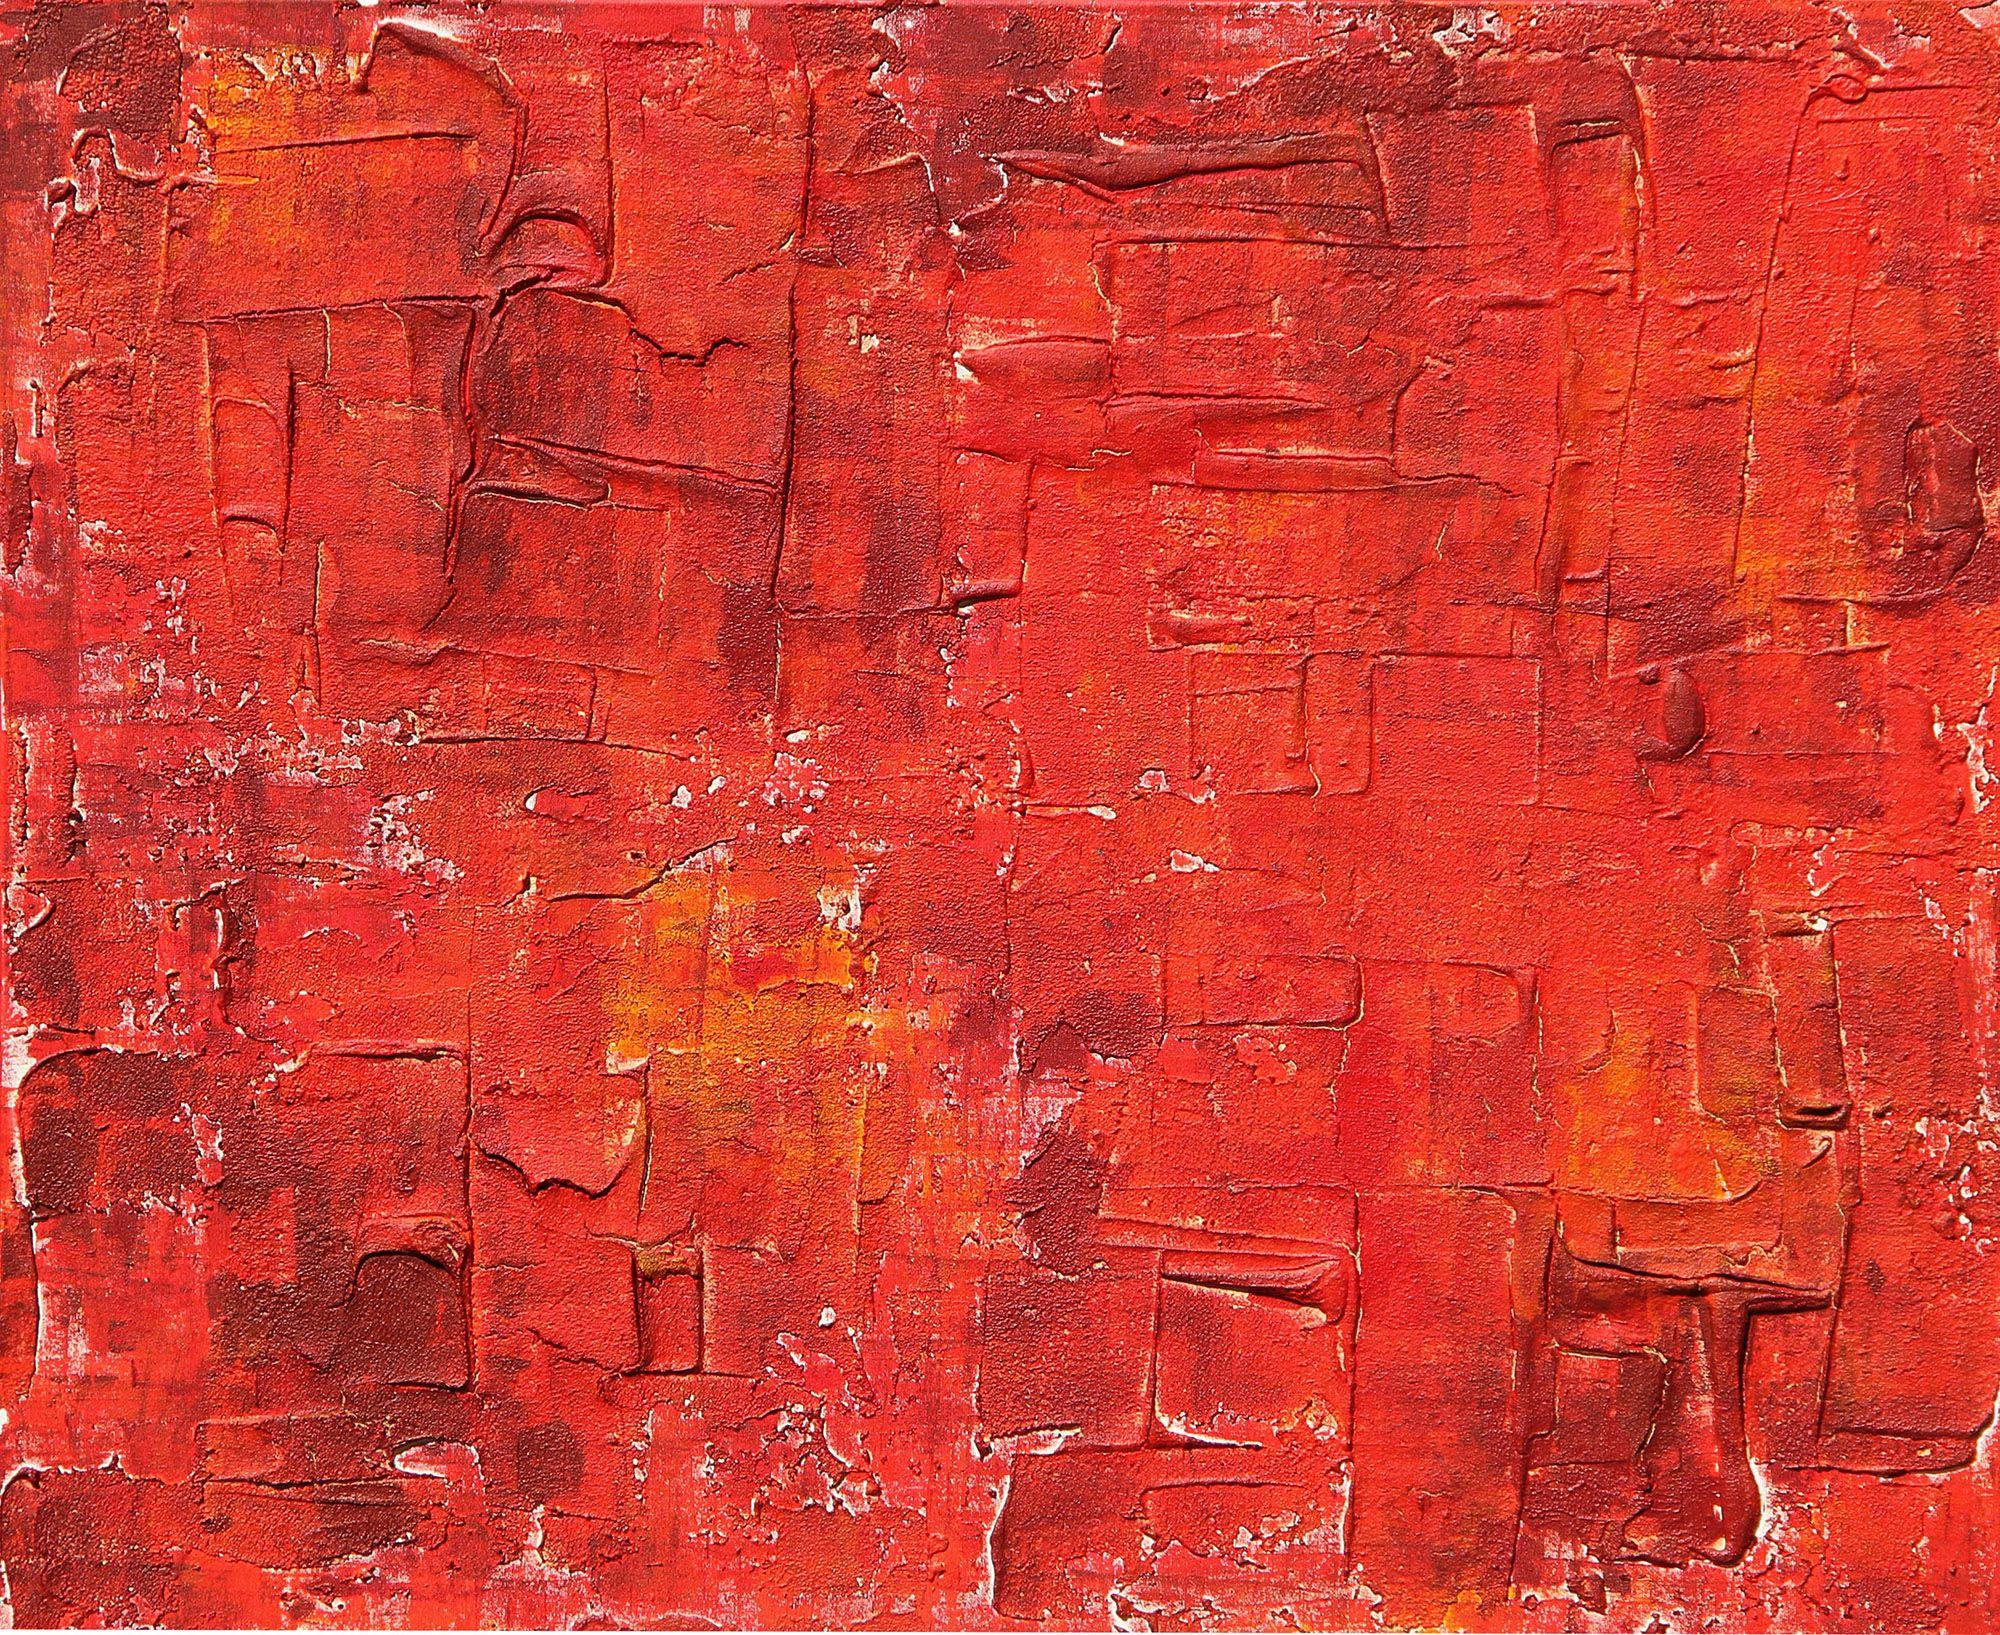 Silhouette by Buse Tanıl Tuval üzerine Karışık Teknik / #Mixedmedia on #Canvas 110cm x 100cm 4.650₺ / 1.325$  #gallerymak #sanat #ig_sanat #cagdassanat #resim #tablo #soyut #sanatsal #contemporaryart #contemporaryartist #painting #acrylicpainting #abstractart #abstractpainting #abstractexpressionism #artblogger #artreview #artcriticism #artcritique #artcritic #artblog #artbloggers #sergi #artgallery #artcollector #artlovers #dailyart #